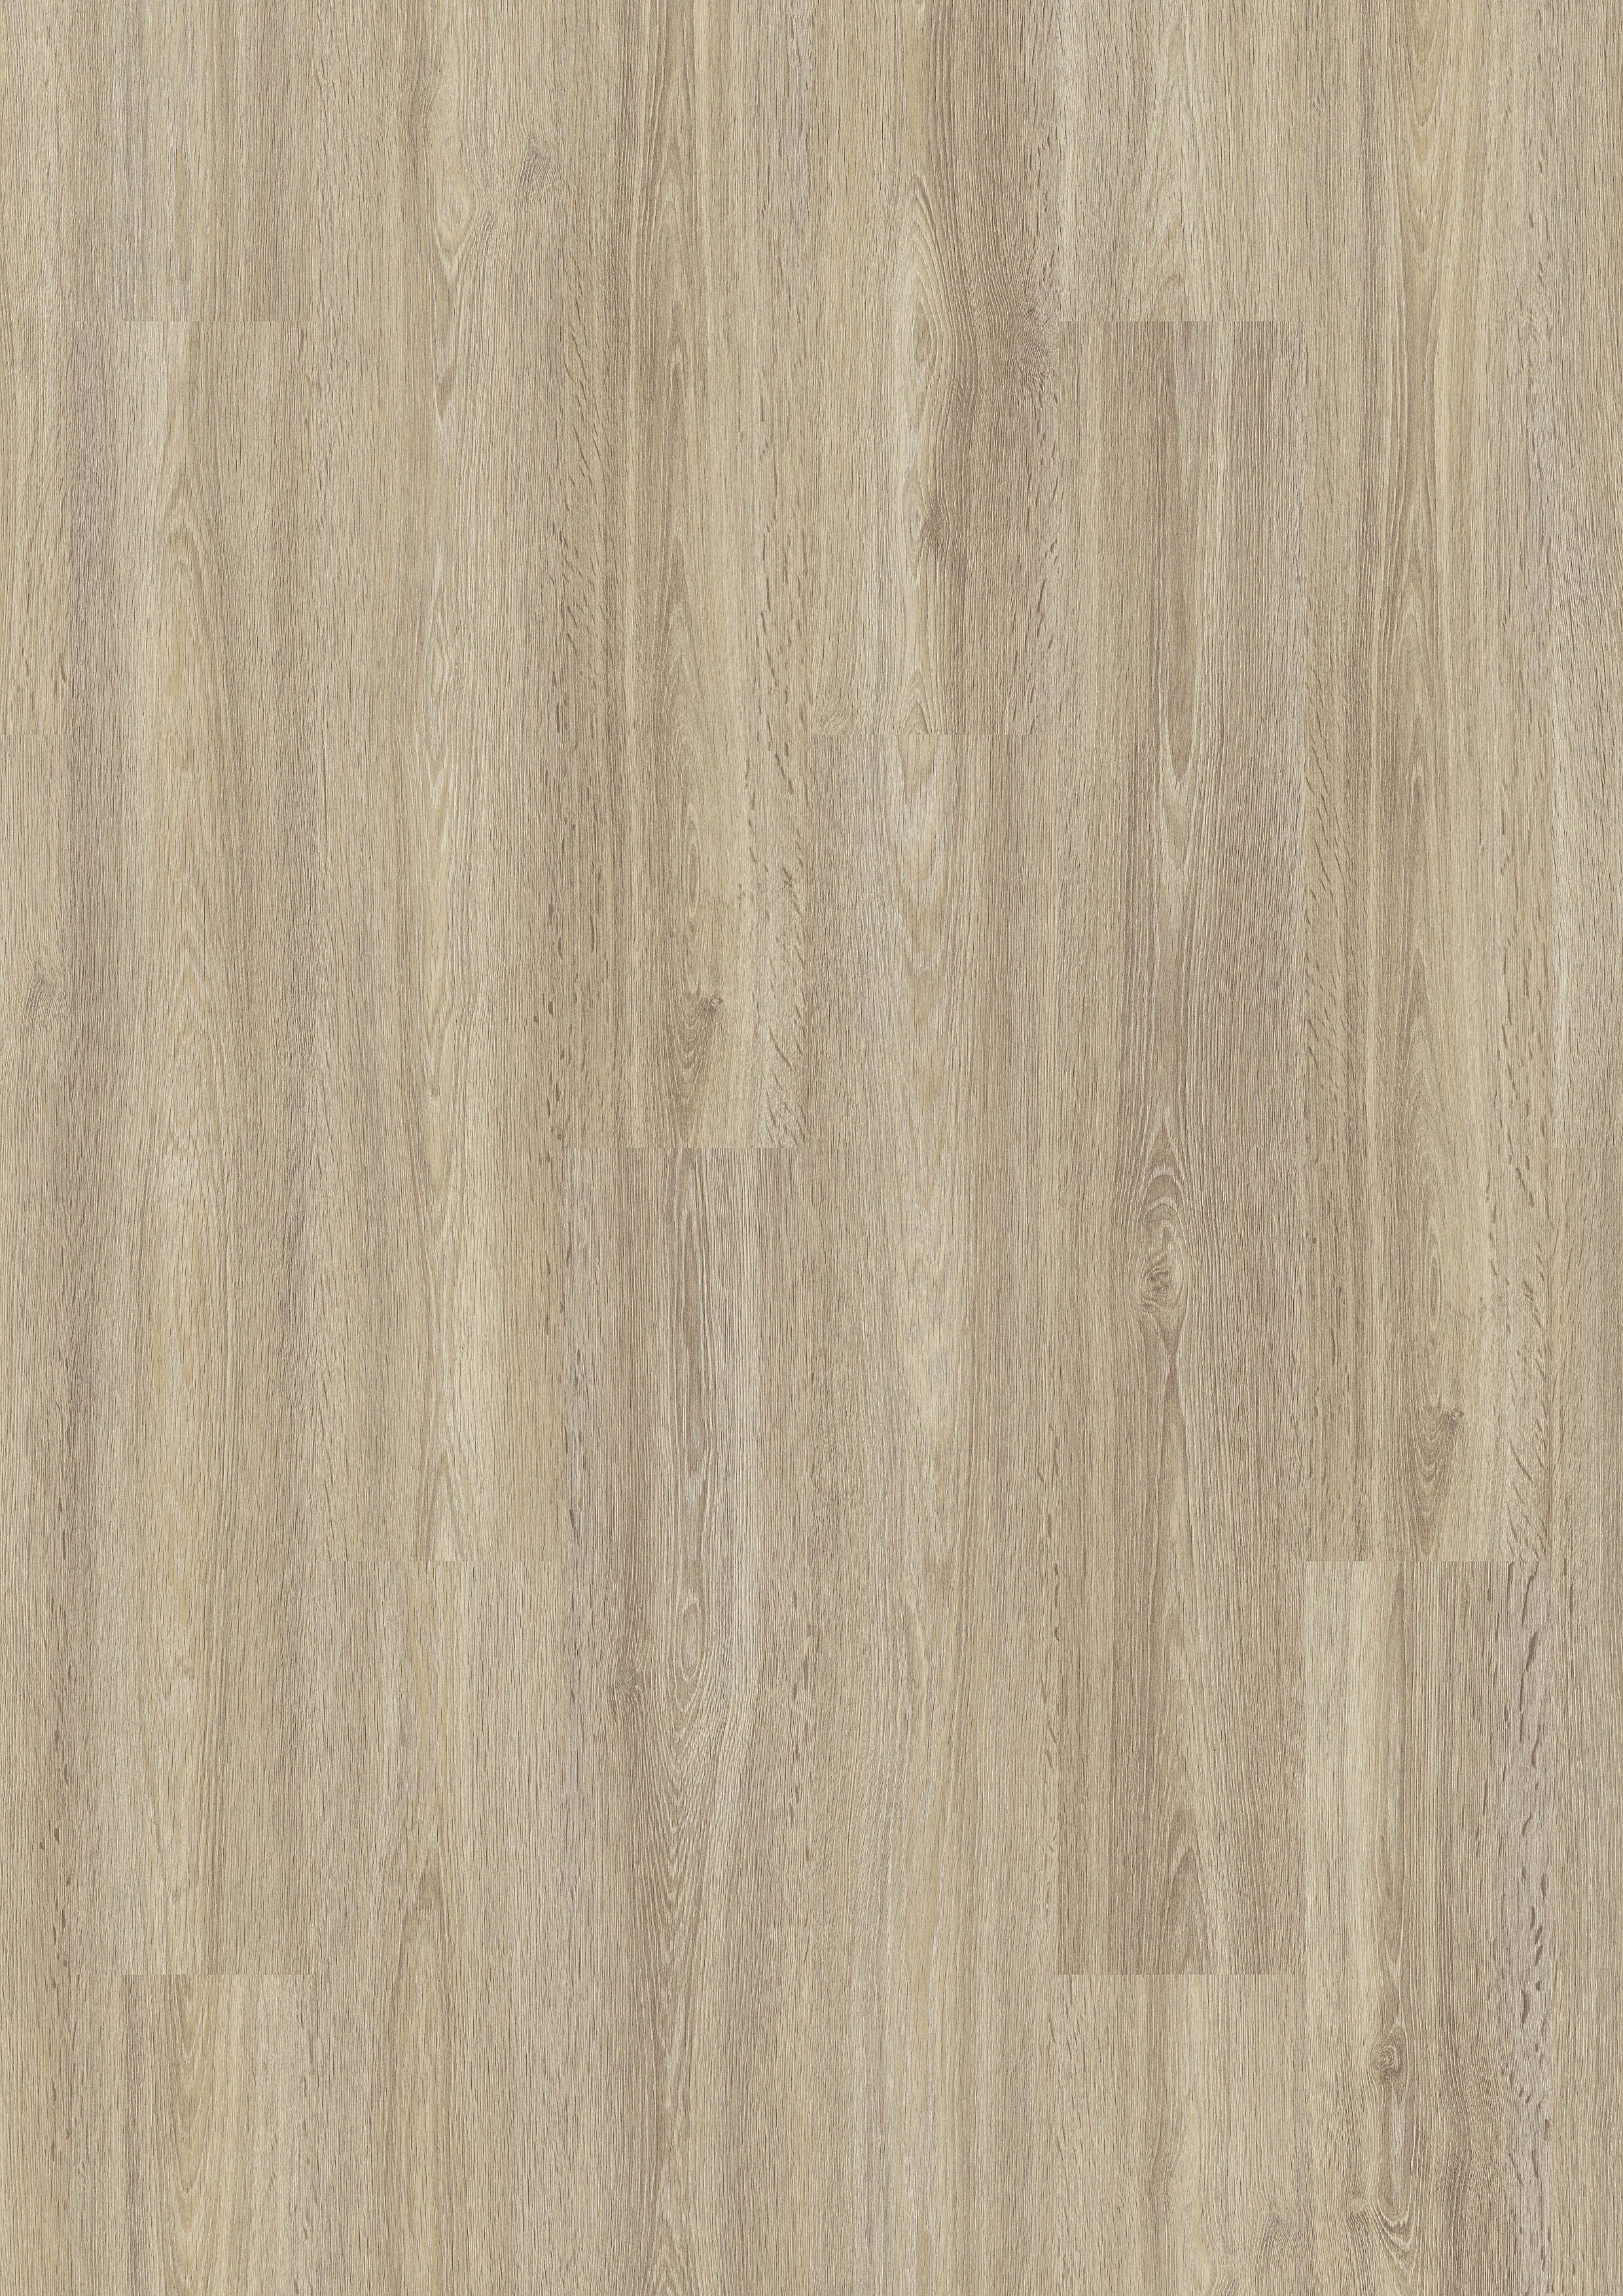 JOKA Classic MADISON 331 Laminat - 3018 - Oak Limed